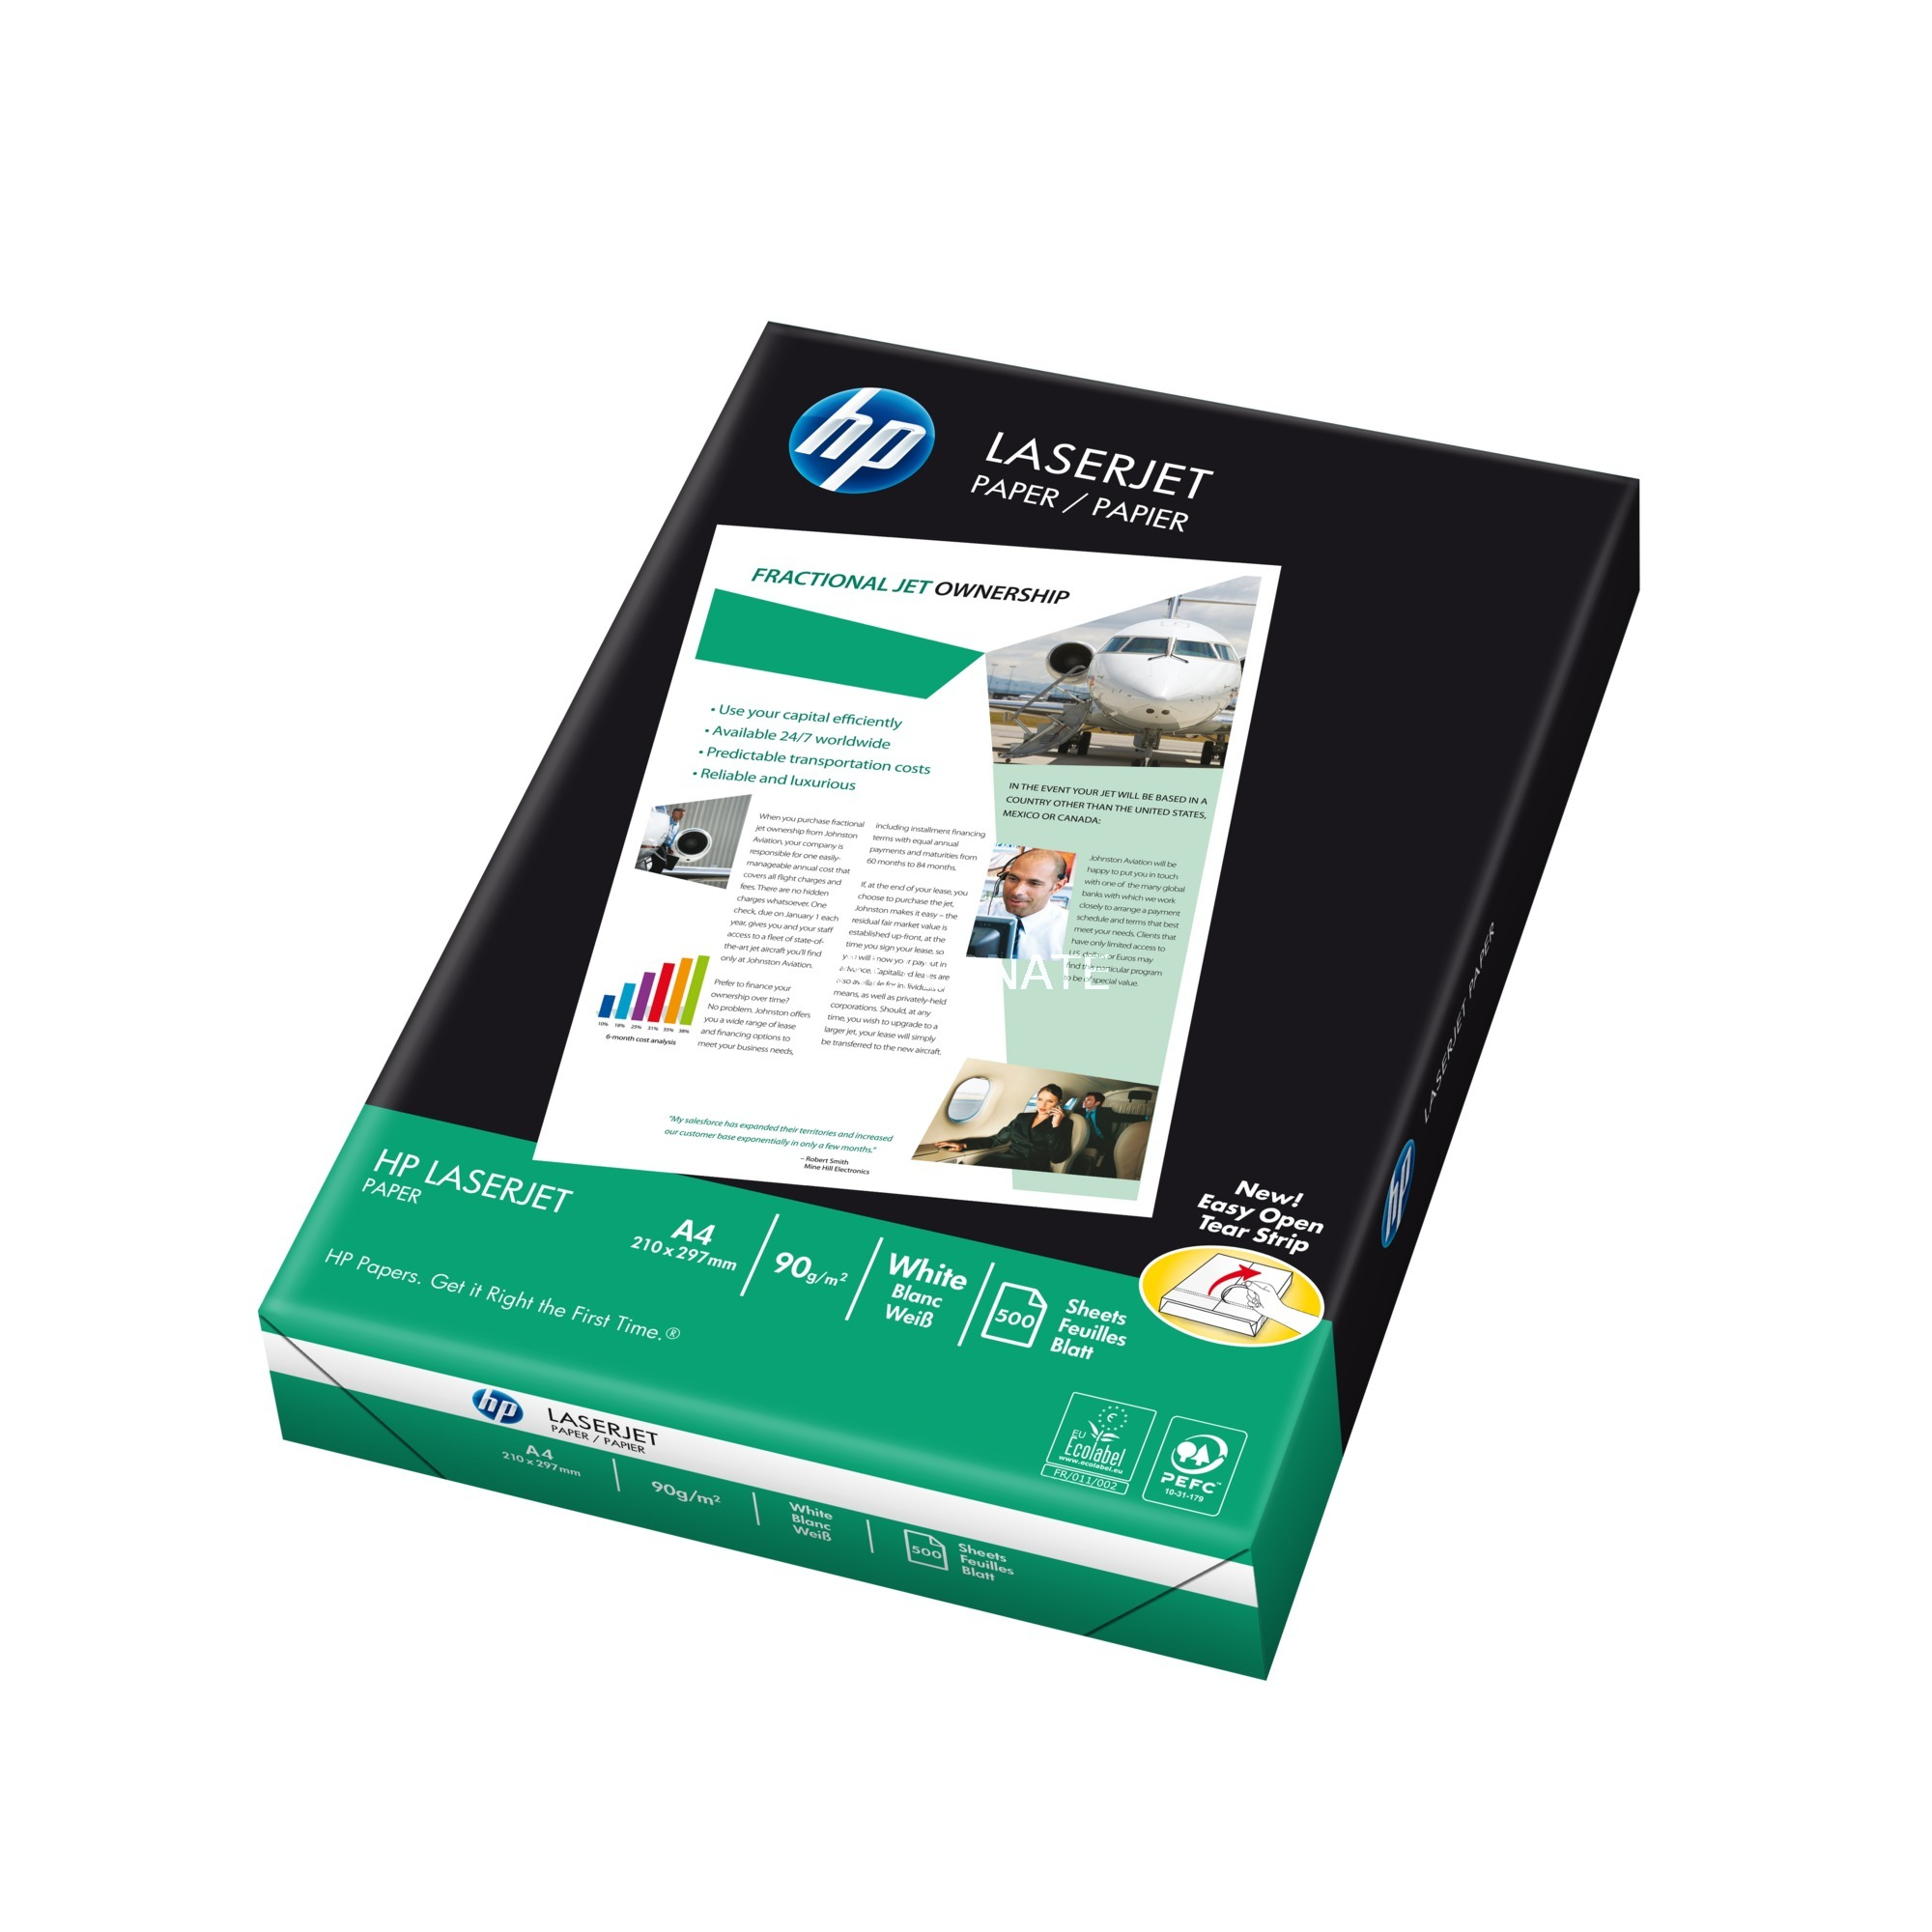 chp310-mat-hvid-papir-til-blakprinter